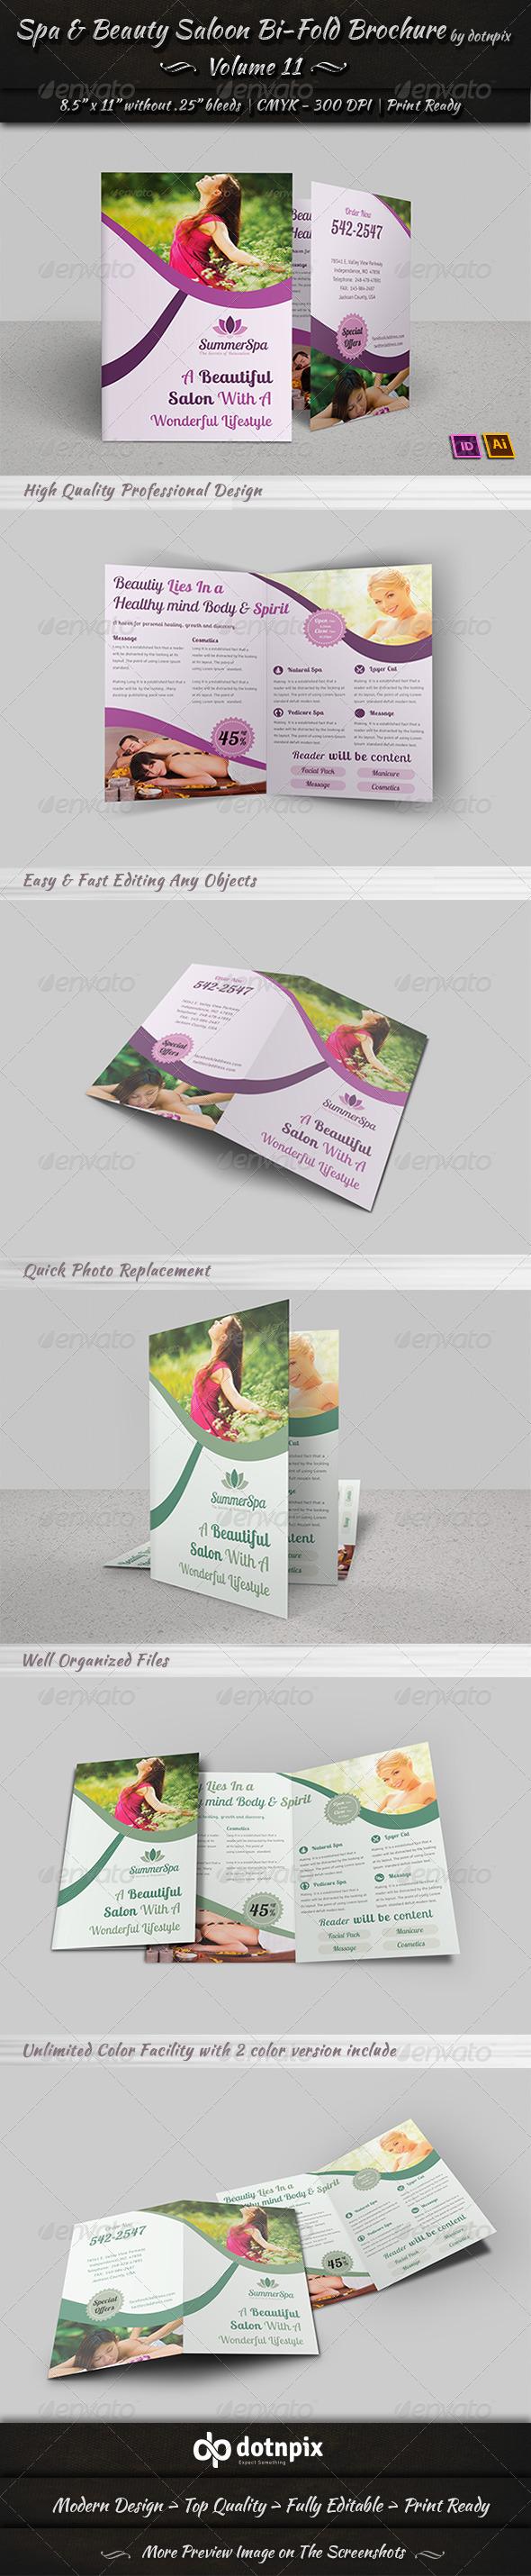 GraphicRiver Spa & Beauty Saloon Bi-Fold Brochure Volume 11 6583627